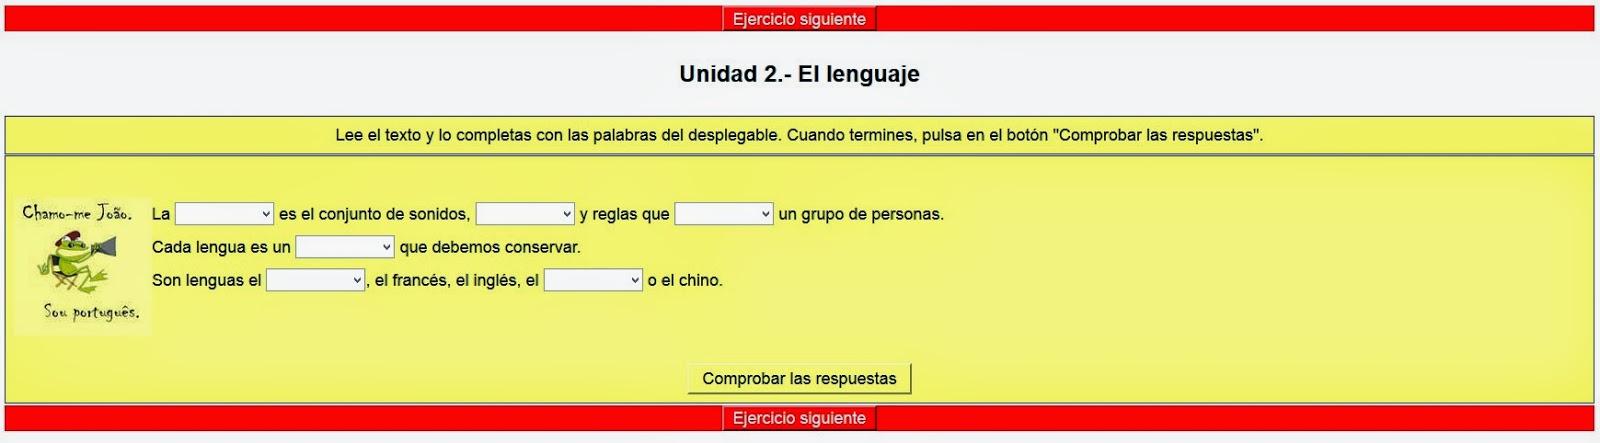 http://cplosangeles.juntaextremadura.net/web/lengua_tercer_ciclo/gramatica/lenguaje/lengua04.htm